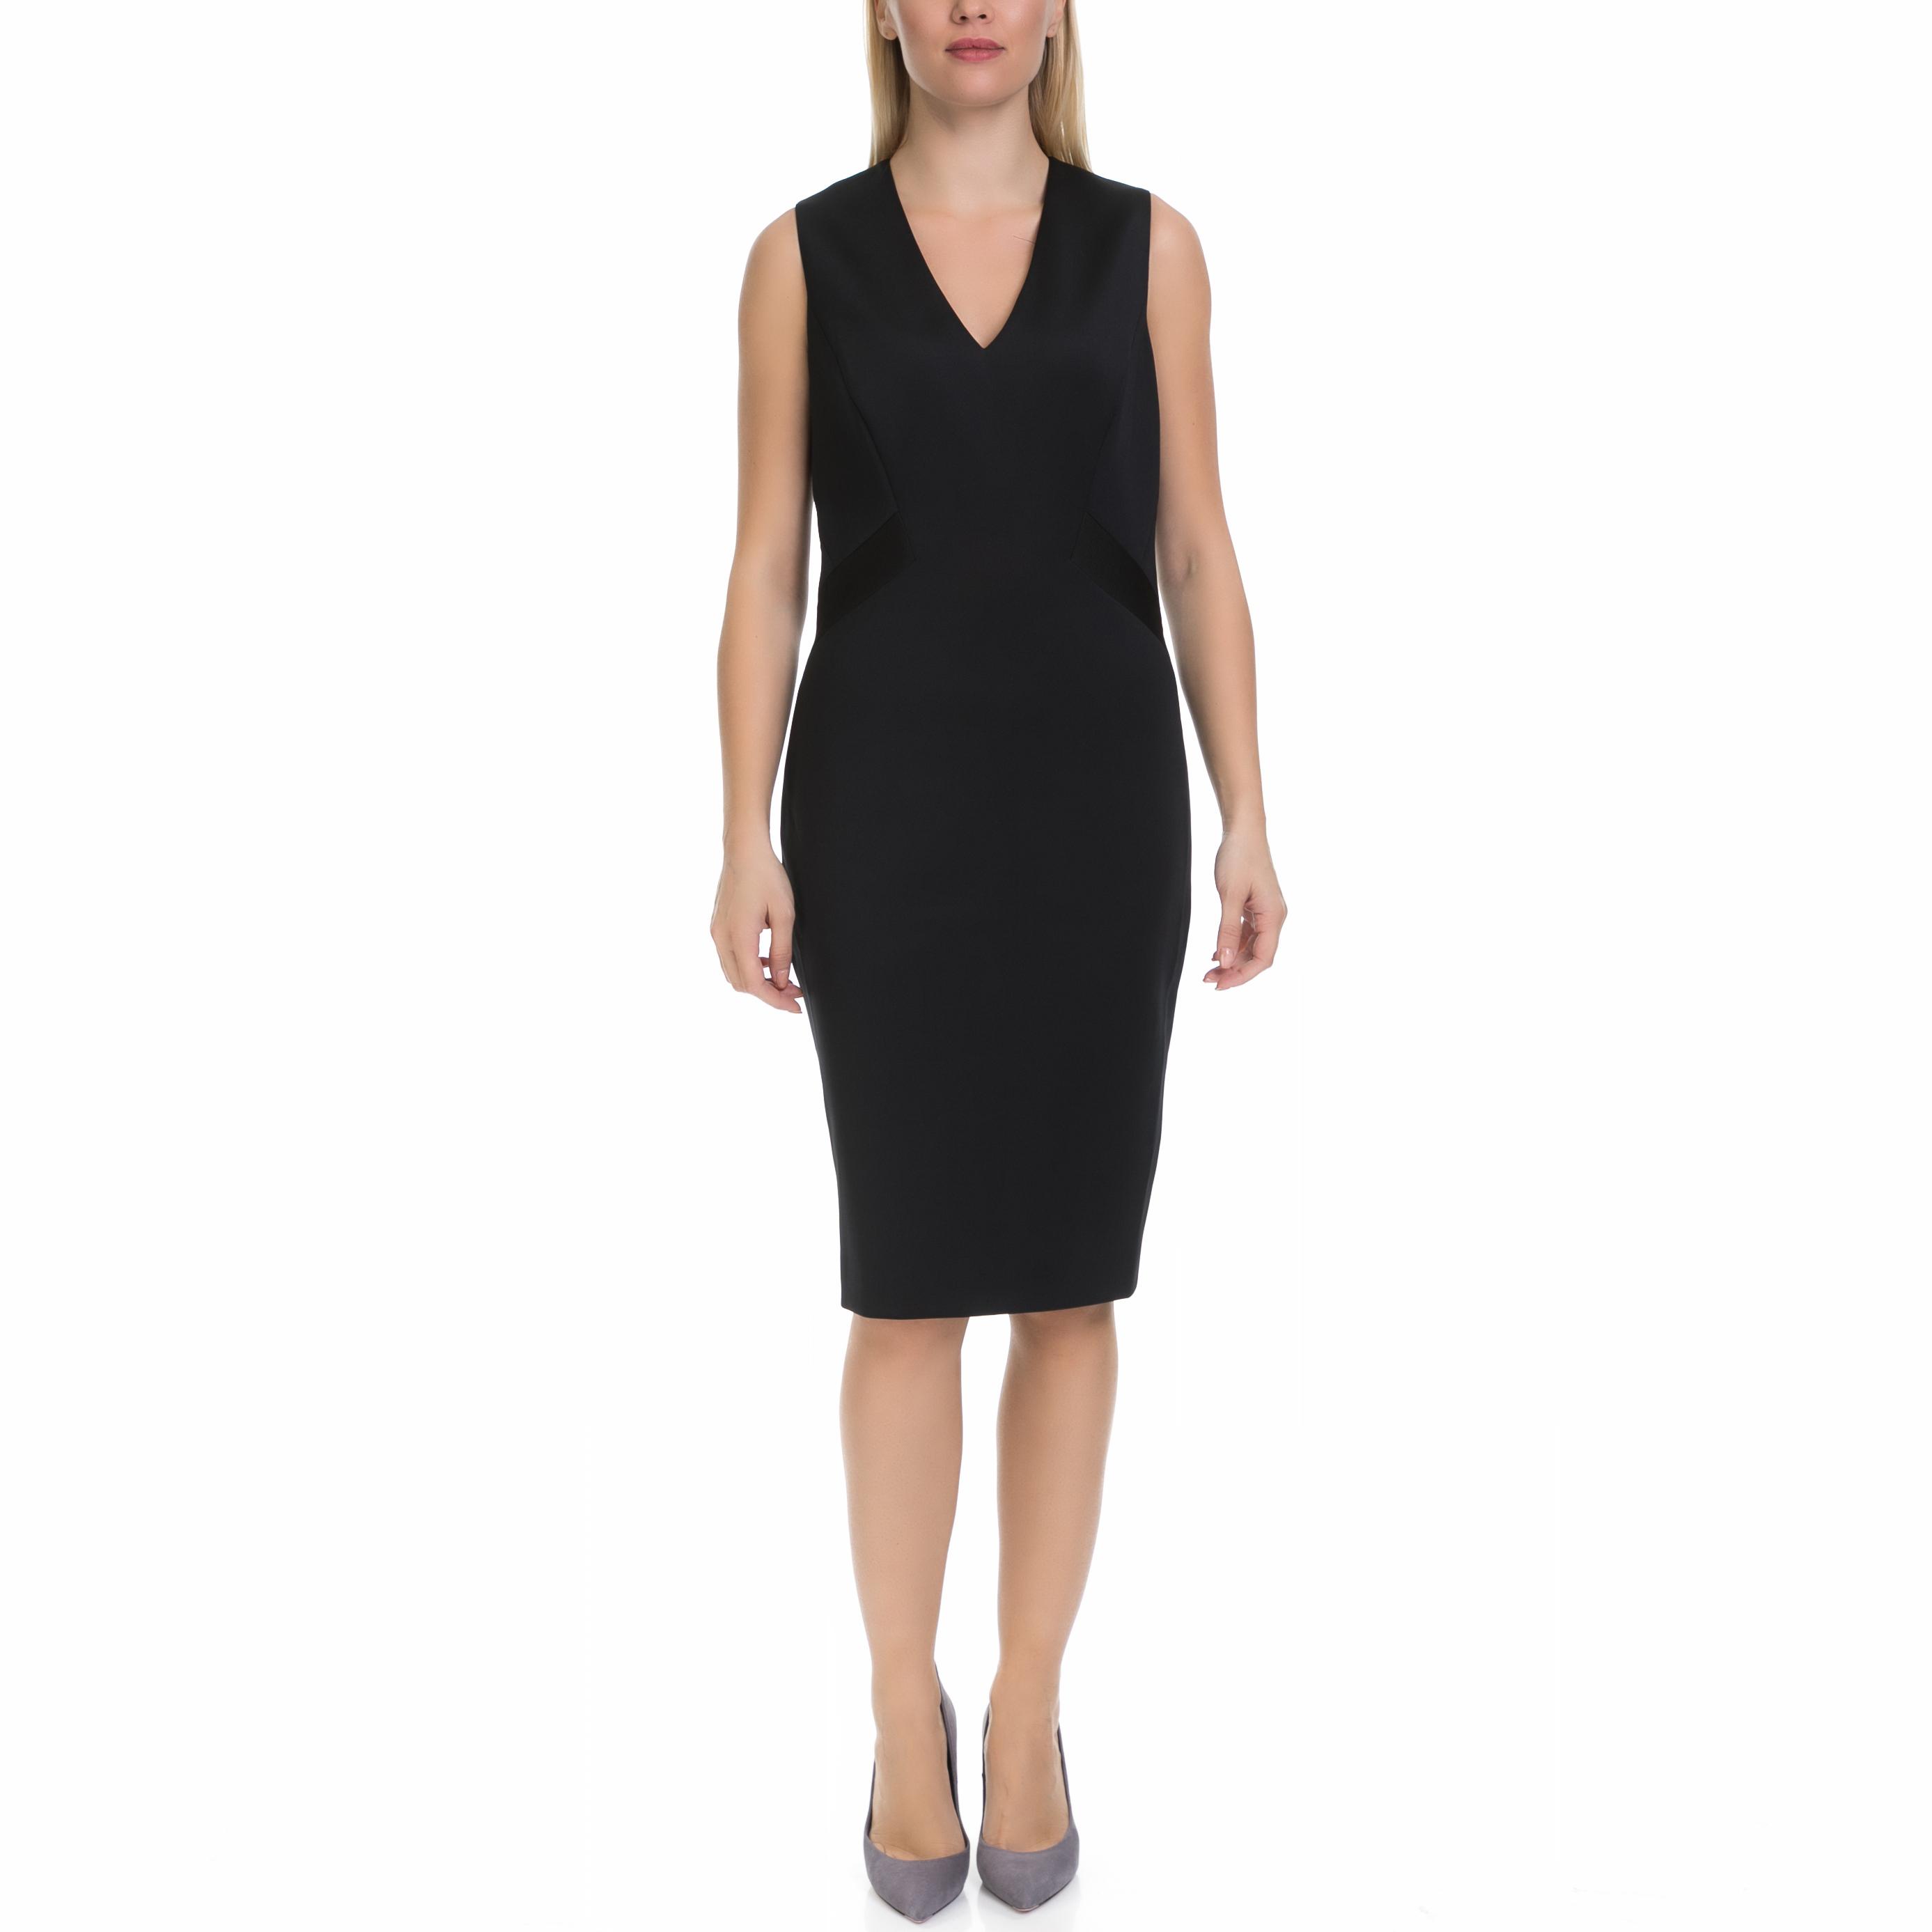 TED BAKER - Γυναικείο φόρεμα AALEYAD TED BAKER μαύρο 129f7665e47